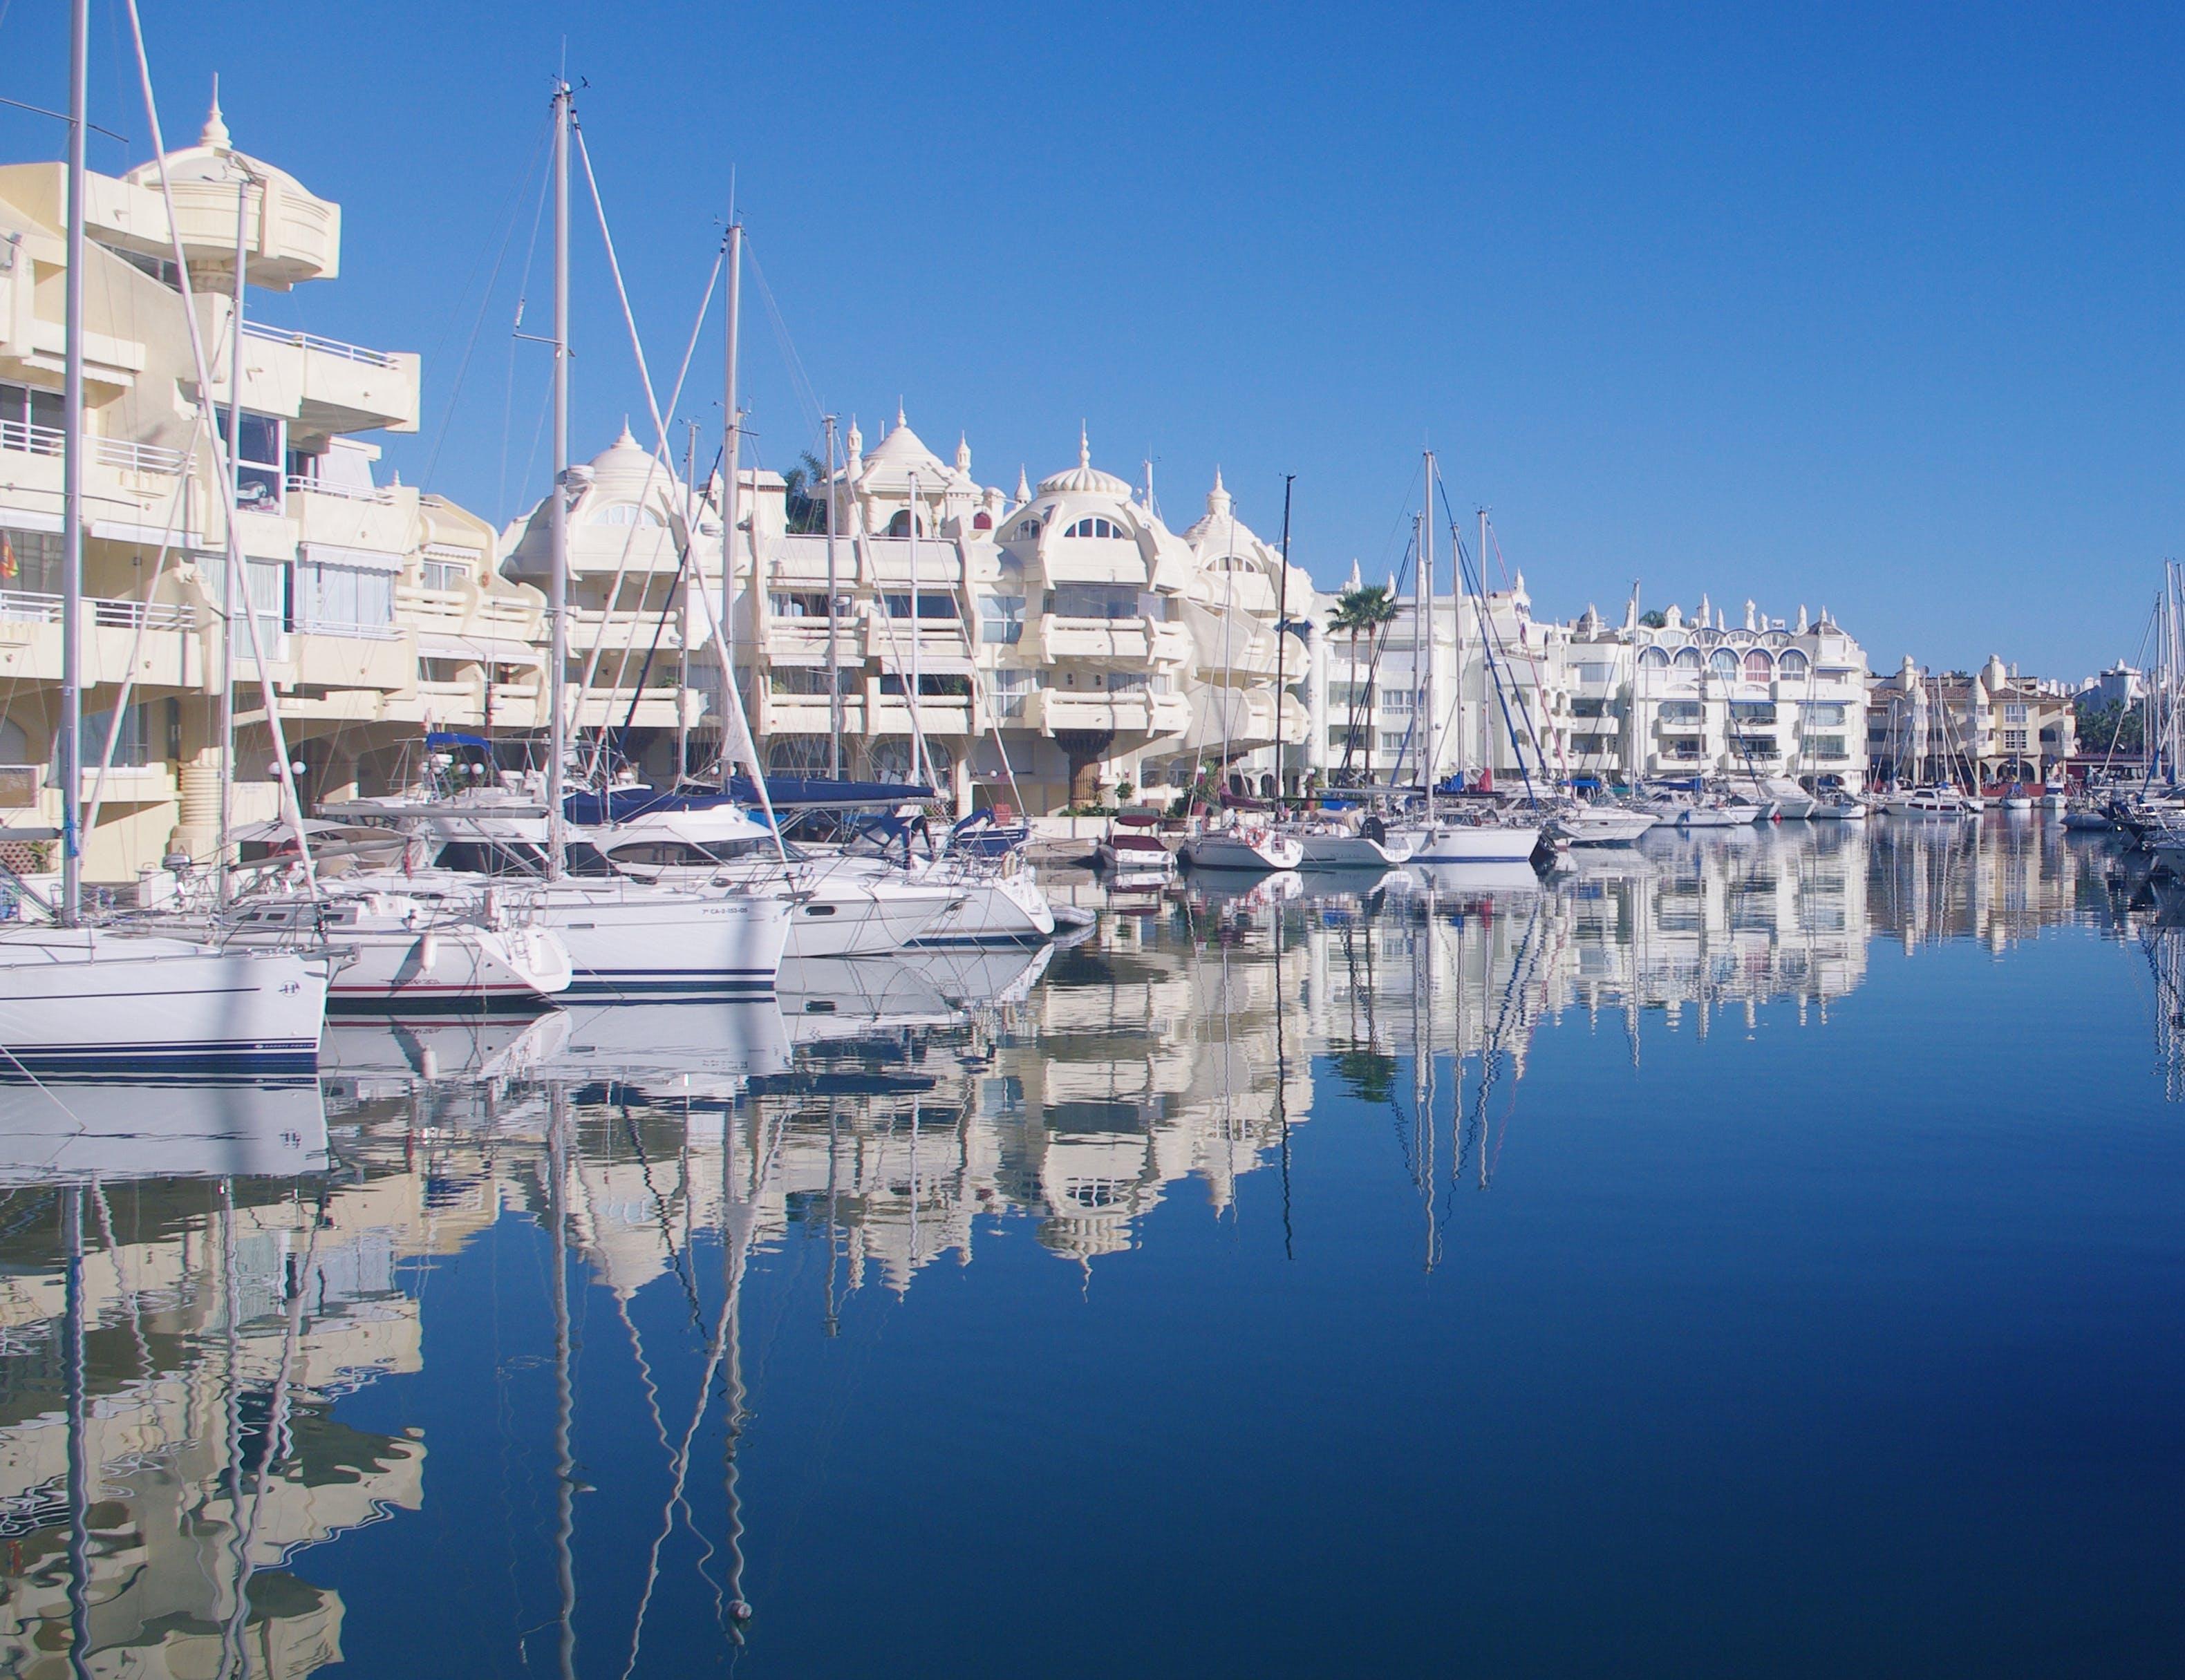 boat, boats, buildings